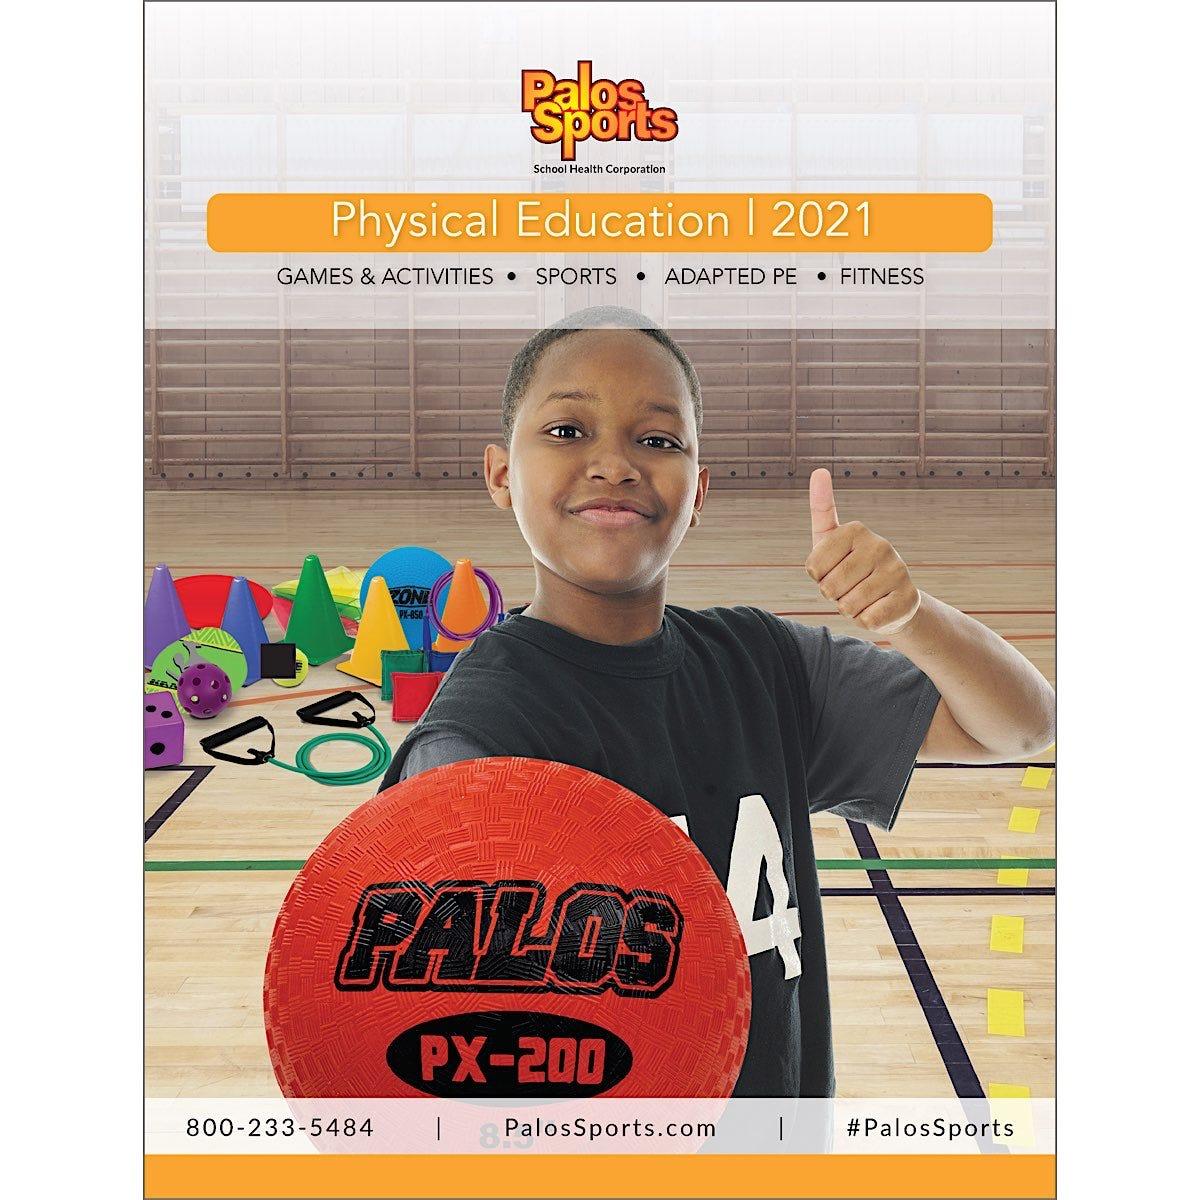 2021 Palos Sports - Physical Education Catalog